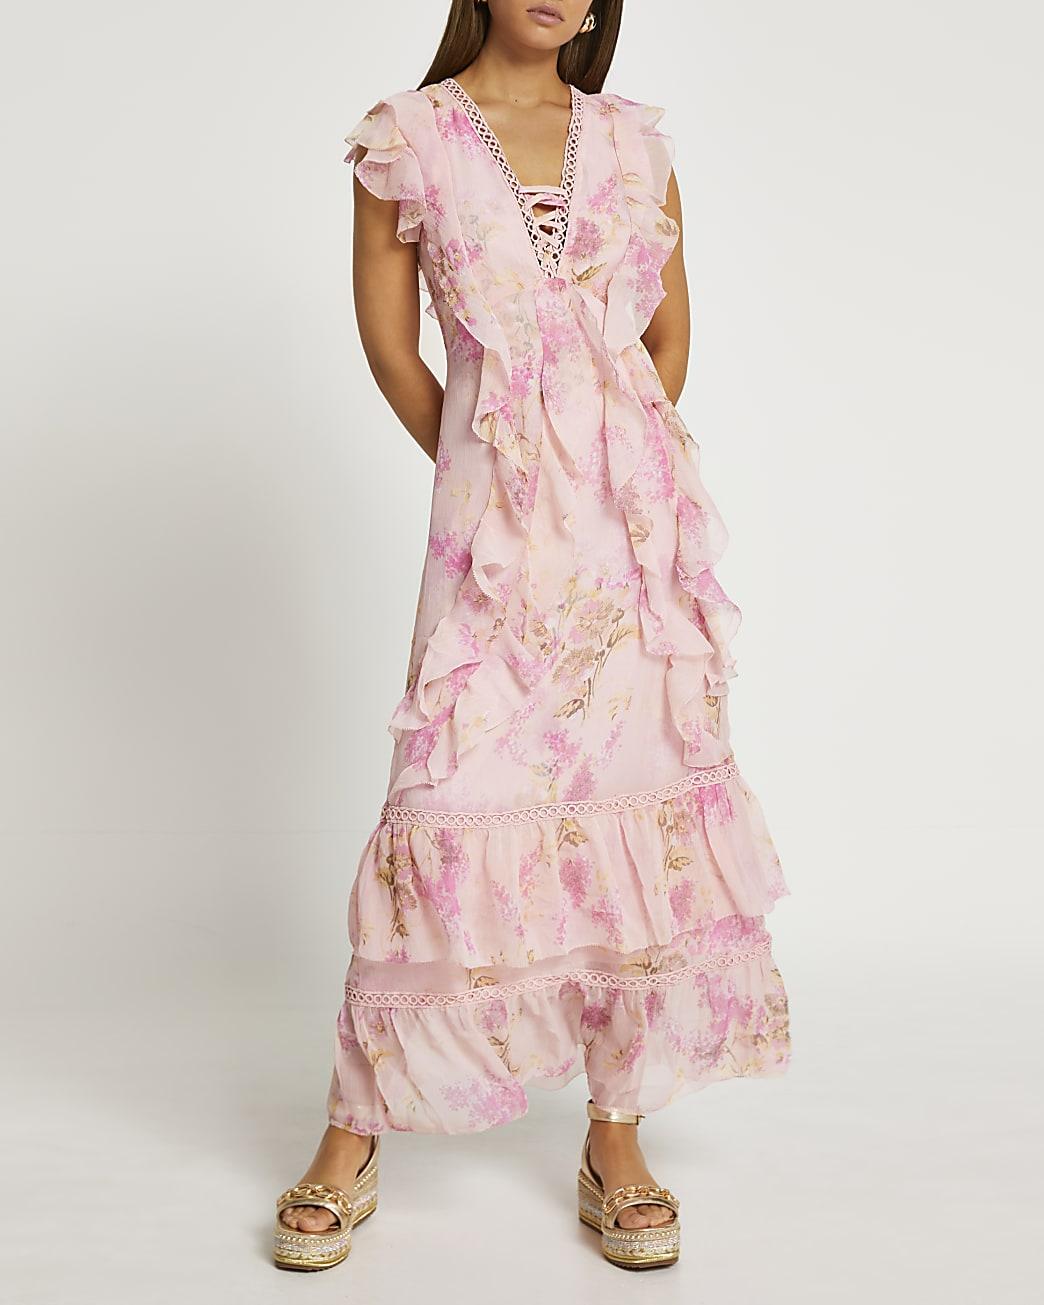 Pink floral print ruffled maxi dress